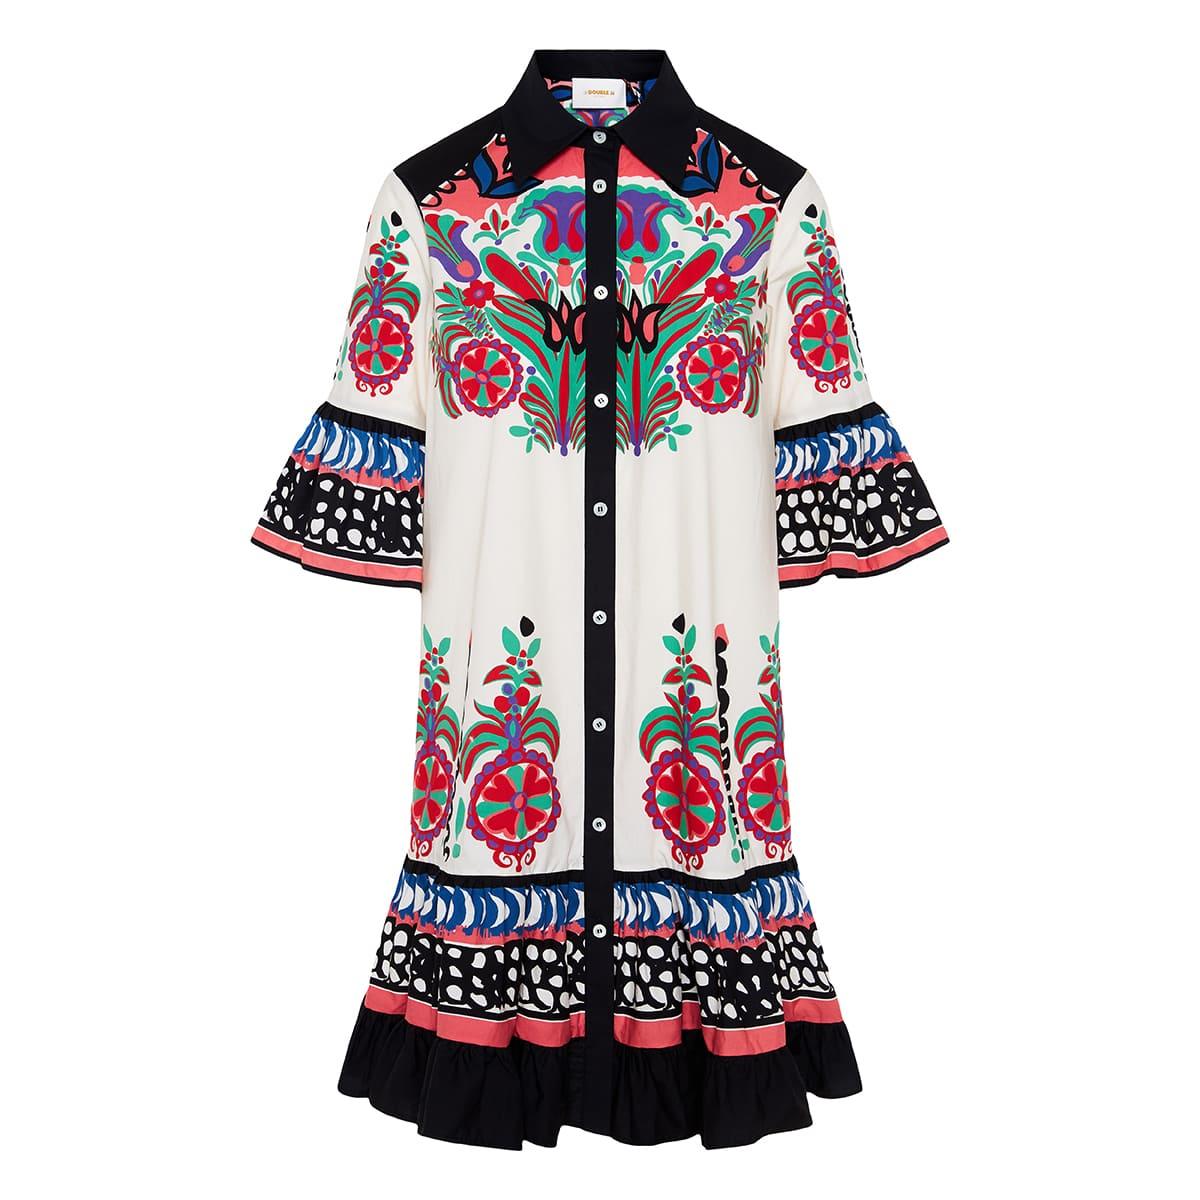 Choux short printed poplin dress